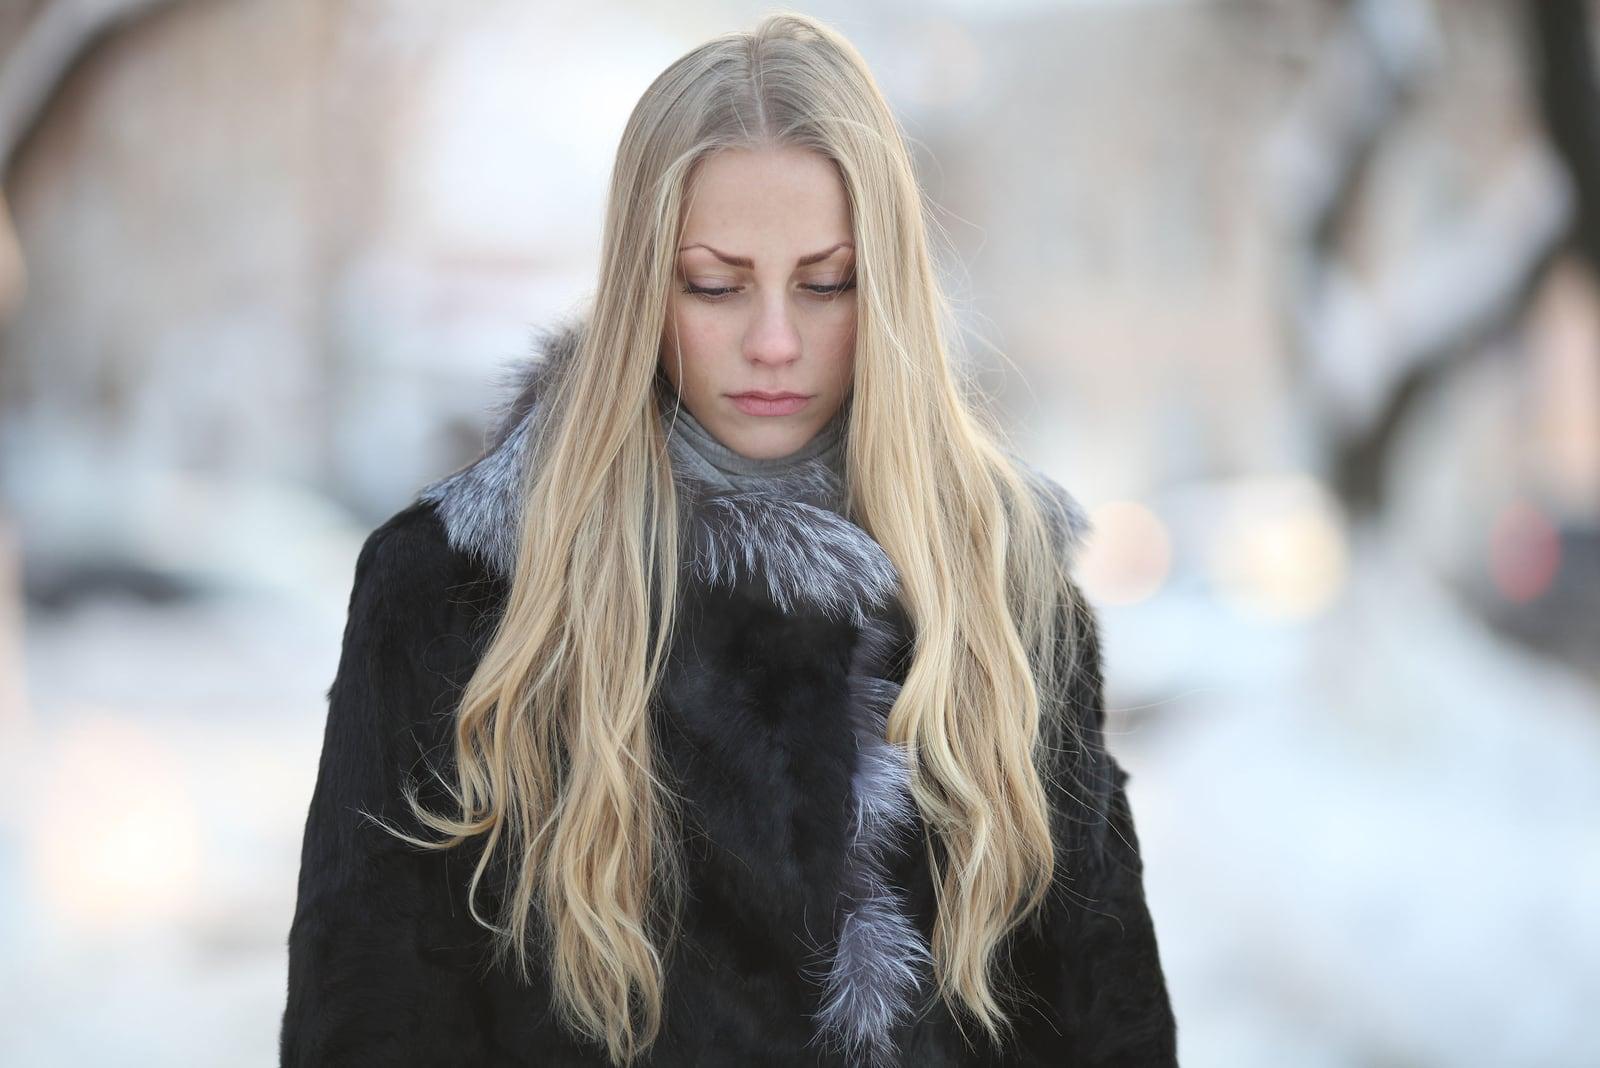 sad beautiful girl, with long blond hair